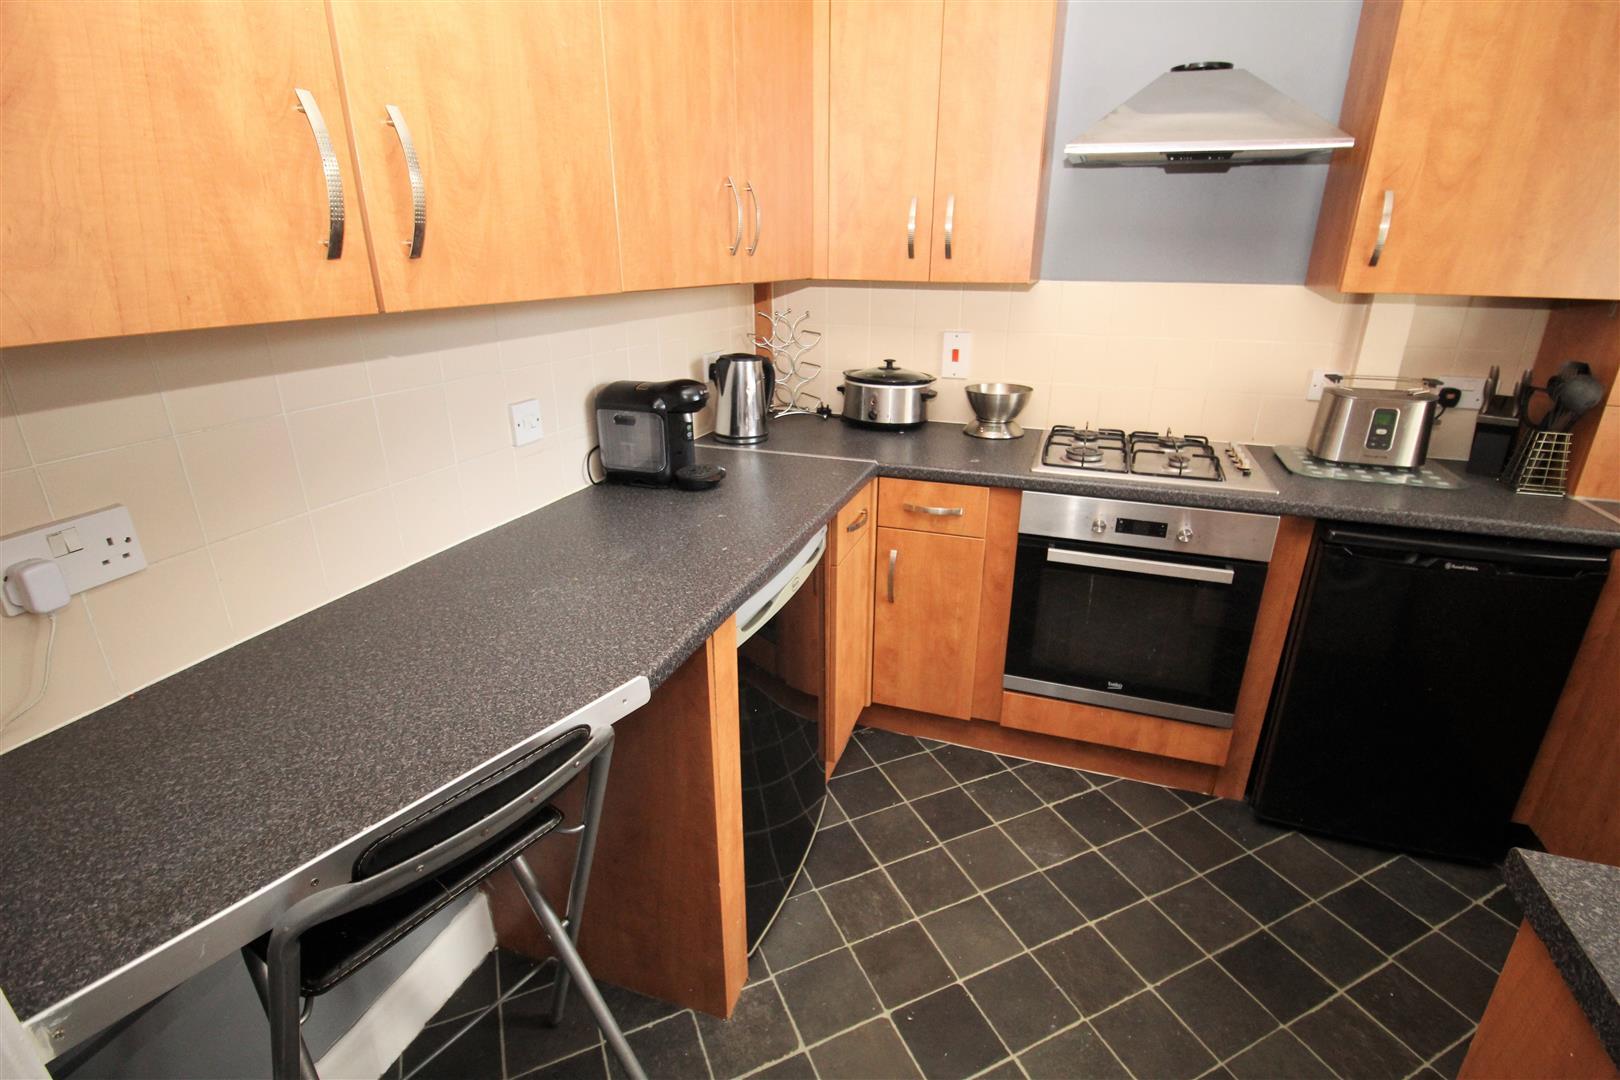 2 Bedrooms, Flat - Ground Floor, Ford Lane, Liverpool